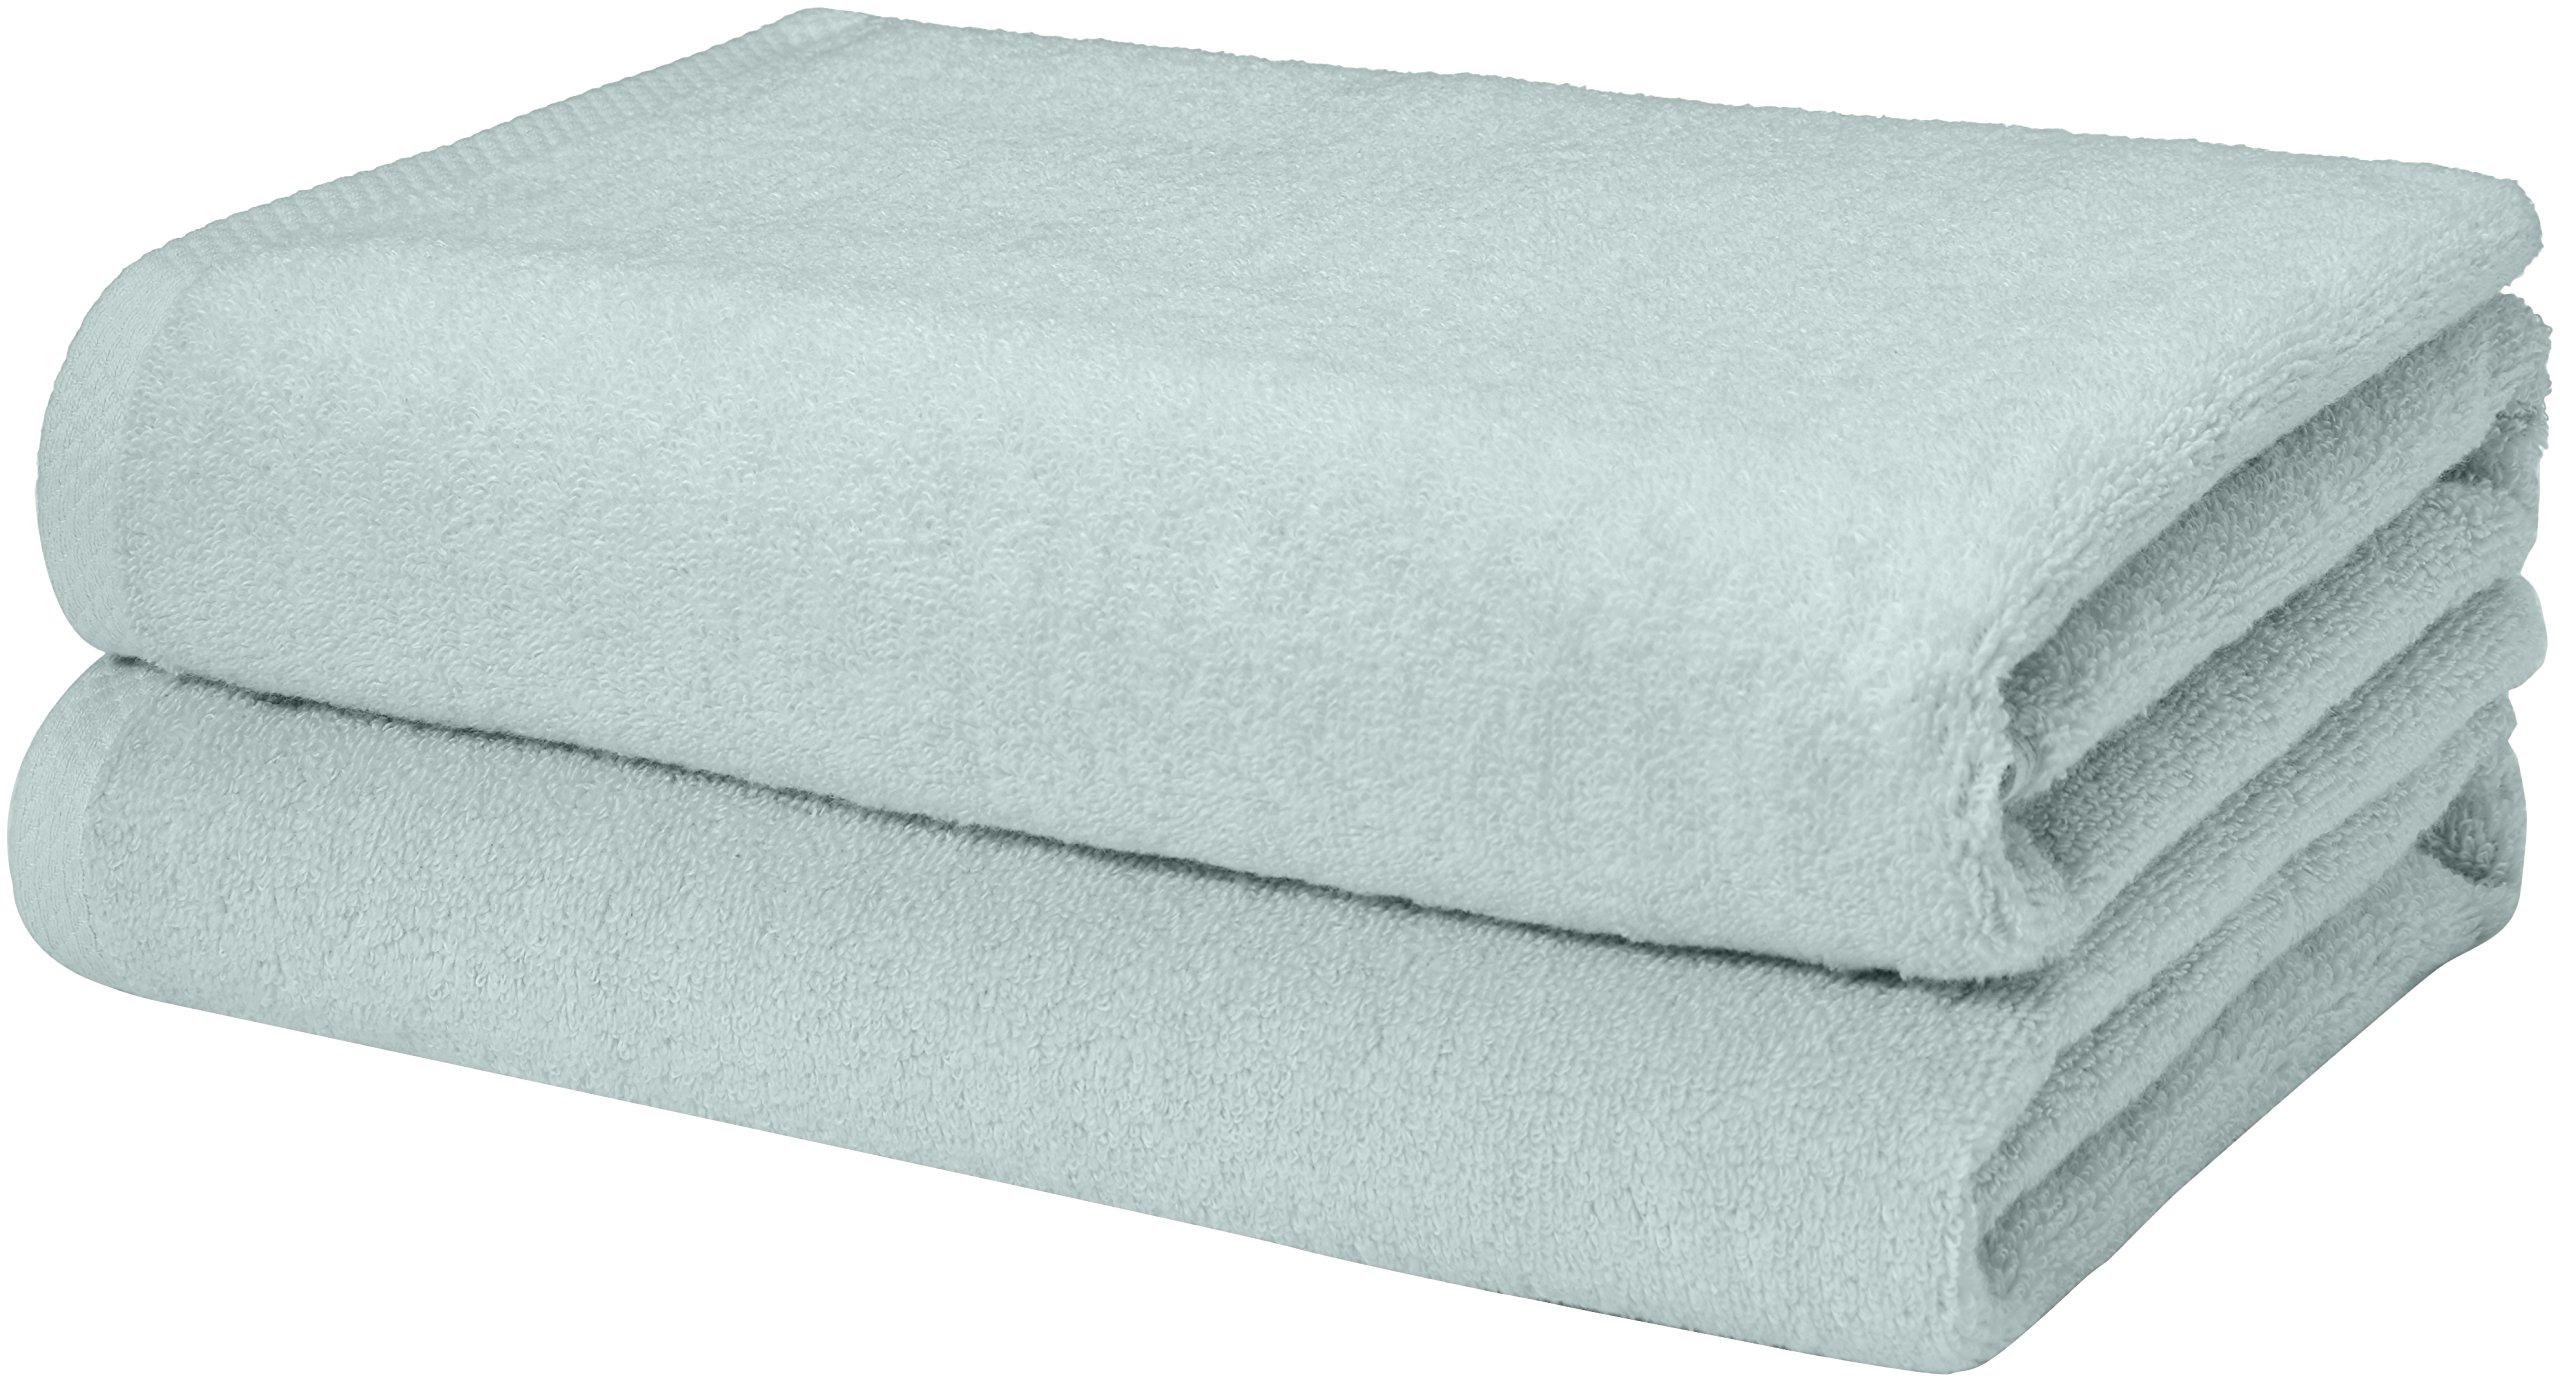 AmazonBasics Quick-Dry, Luxurious, Soft, 100% Cotton Towels, Ice Blue - Set of 2 Bath Towels